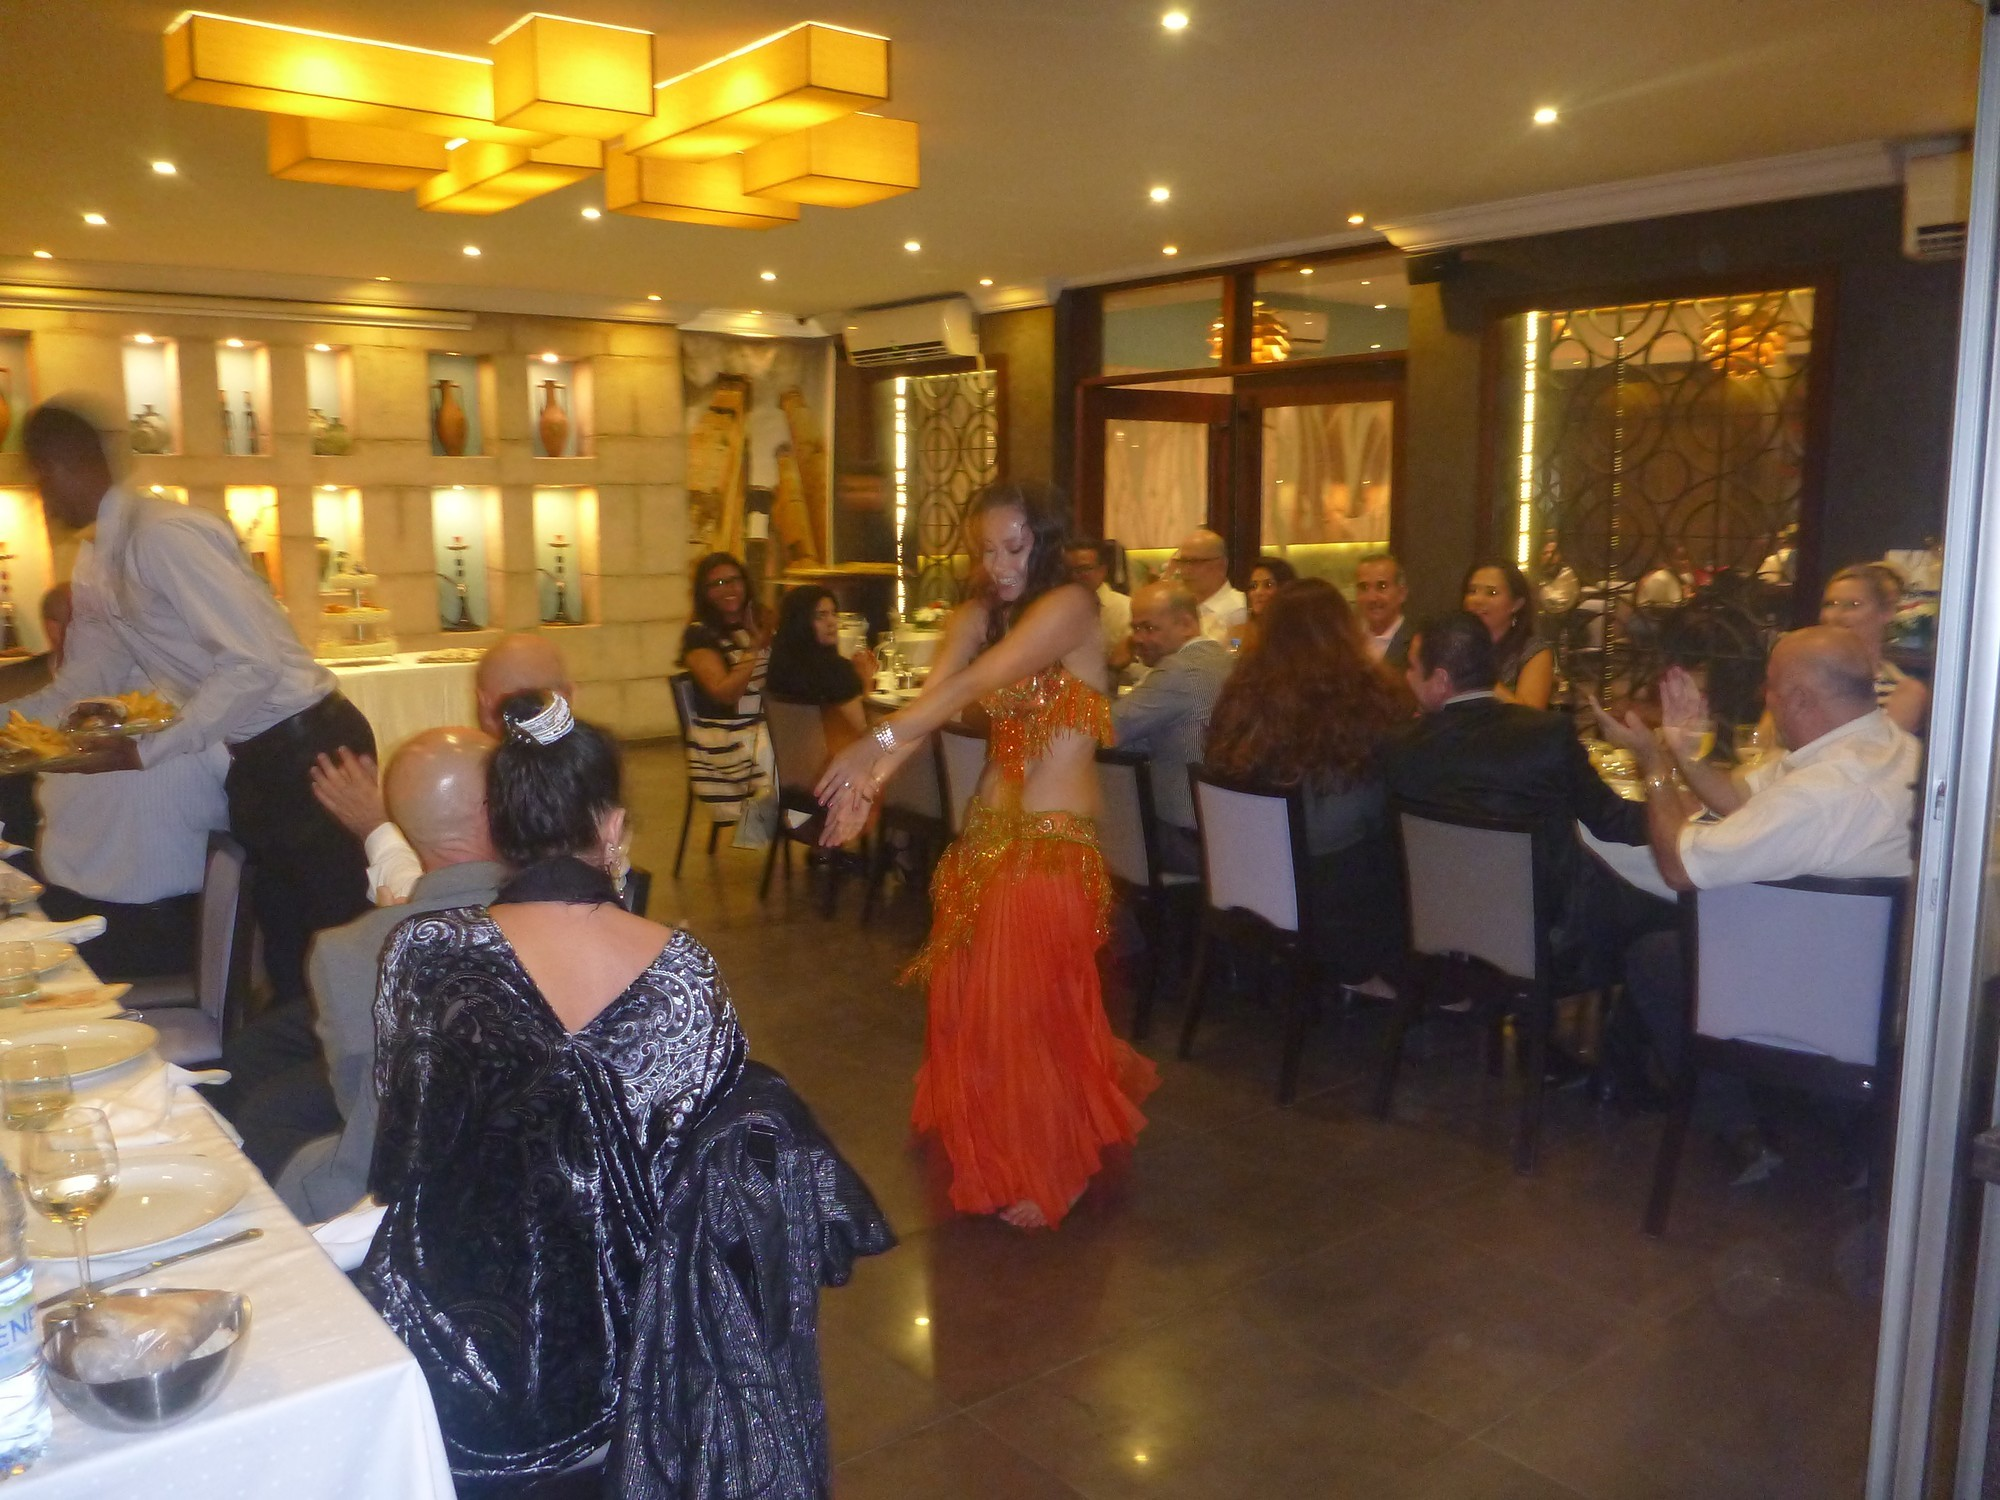 Watching Belly Dancing in Restaurant Farid, Dakar, Senegal